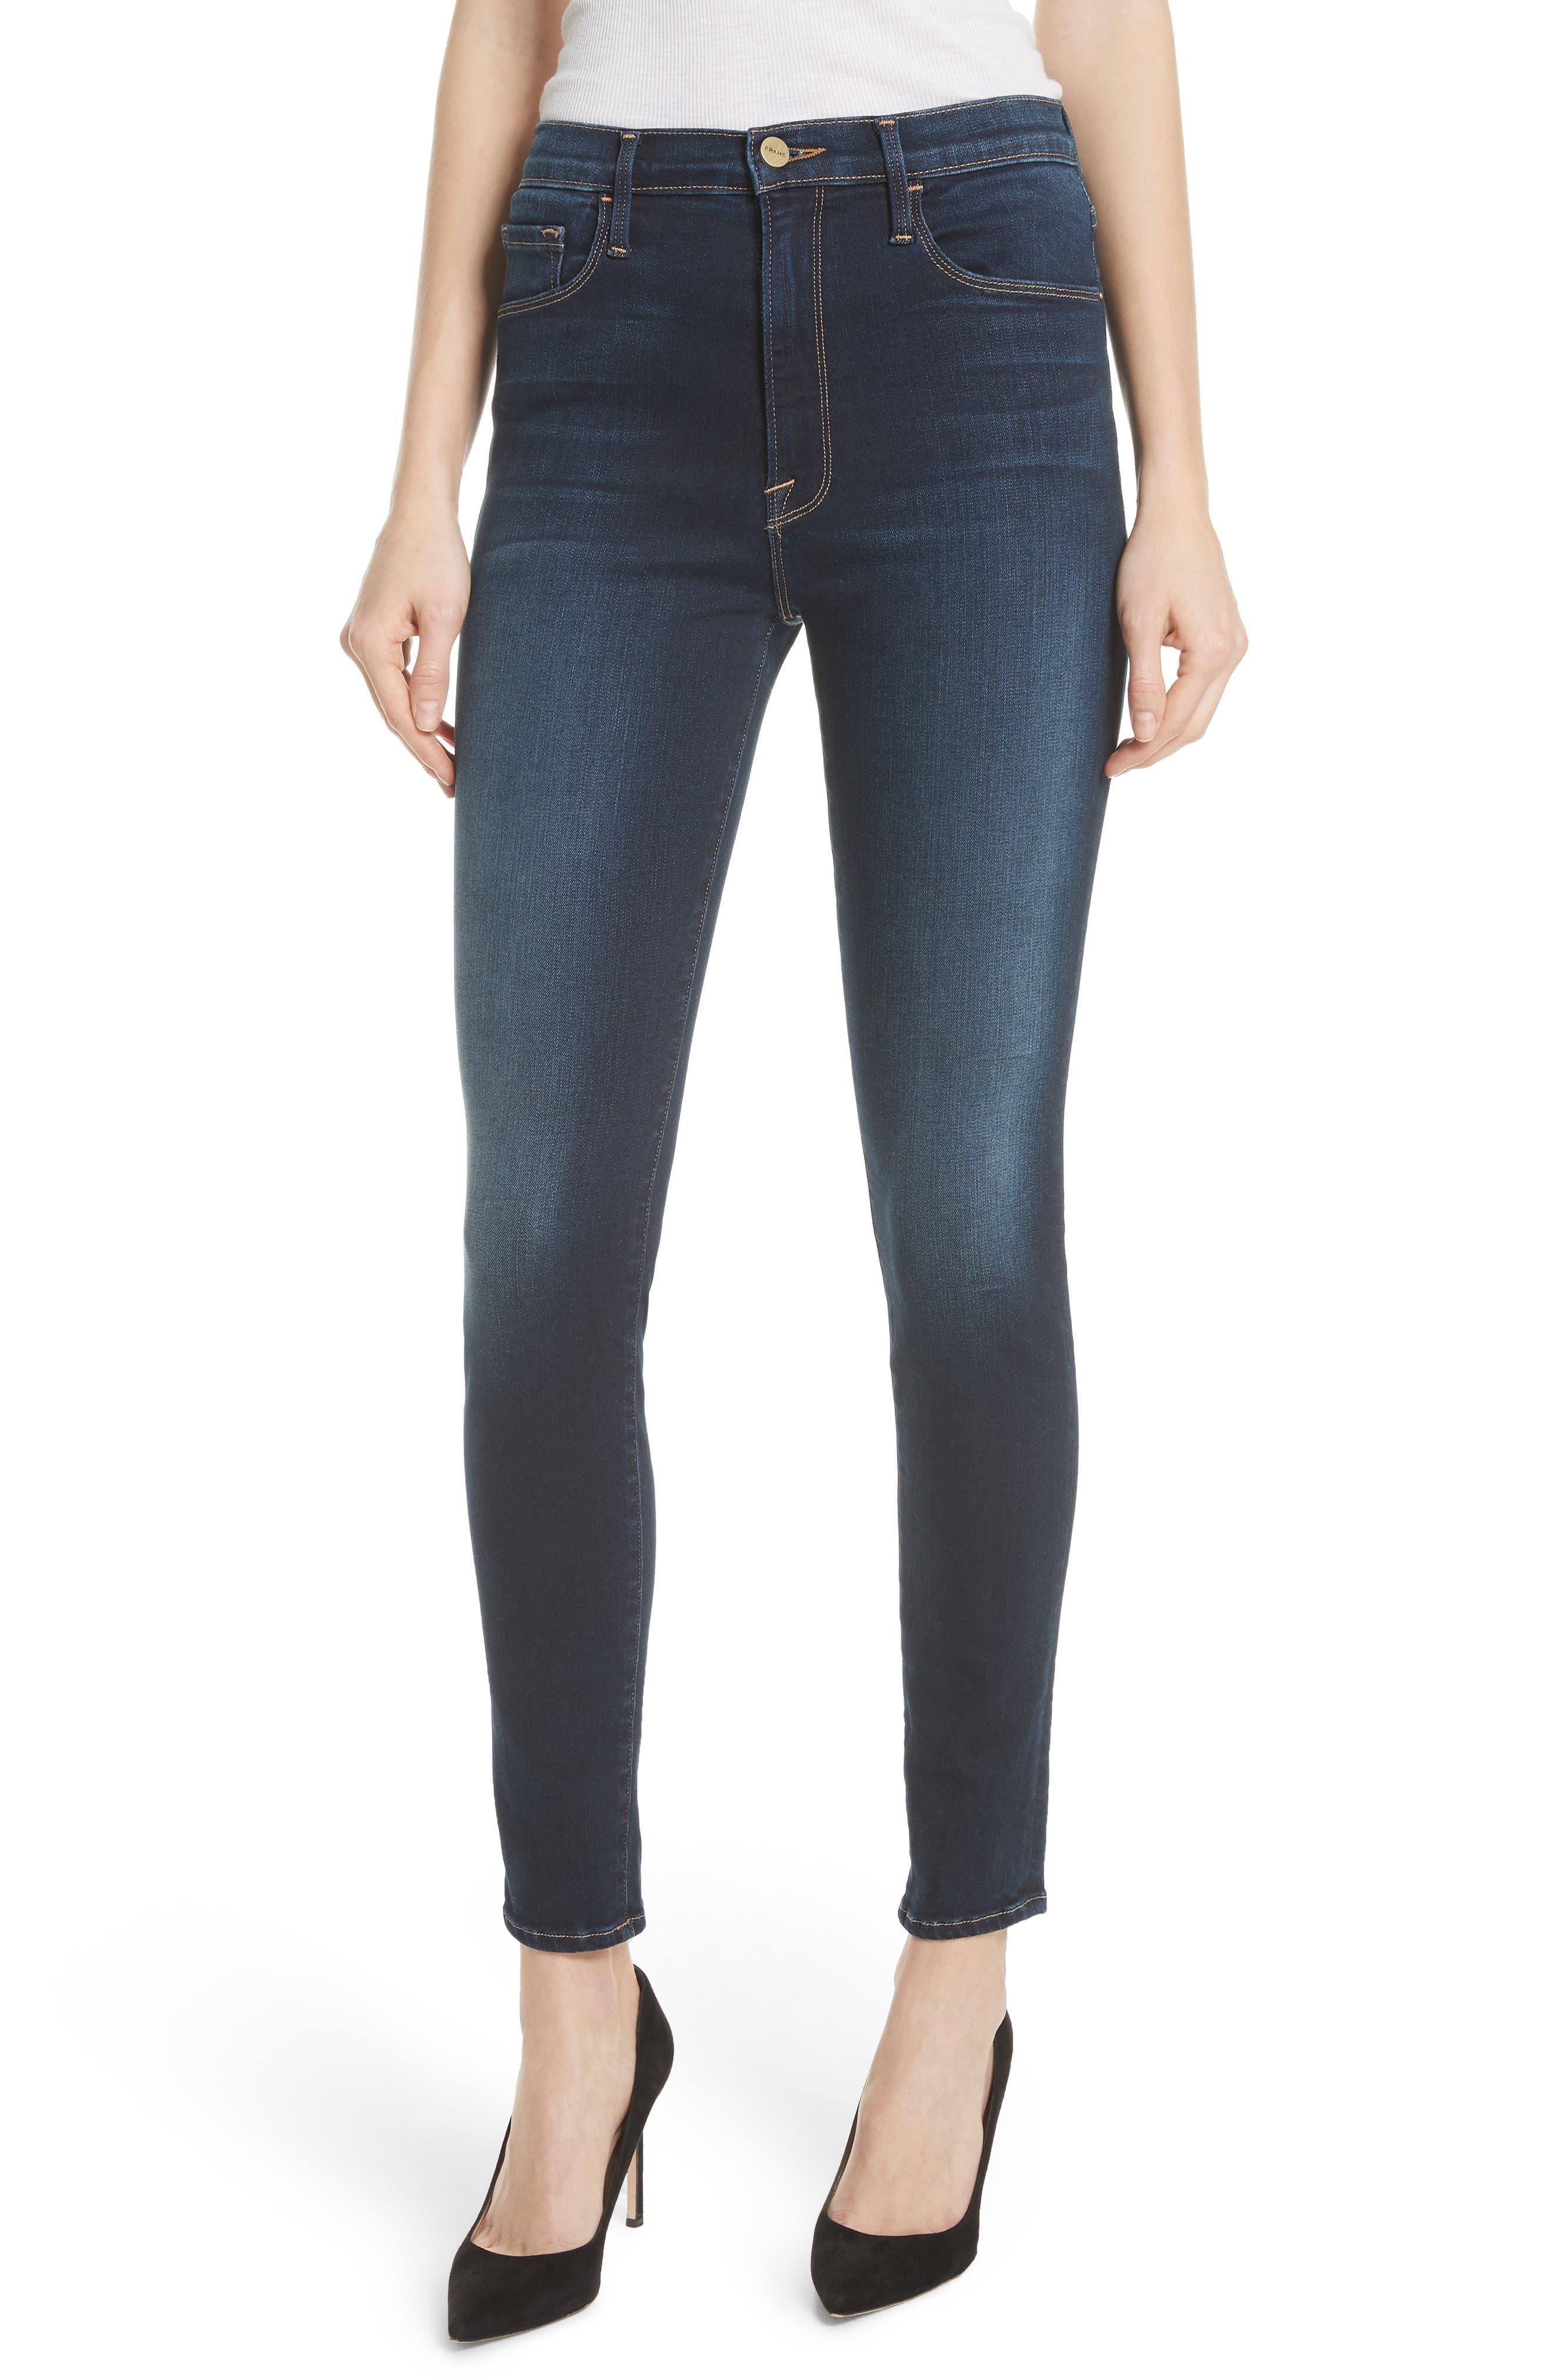 Alternate Image 1 Selected - FRAME Ali High Waist Skinny Jeans (Wayside)